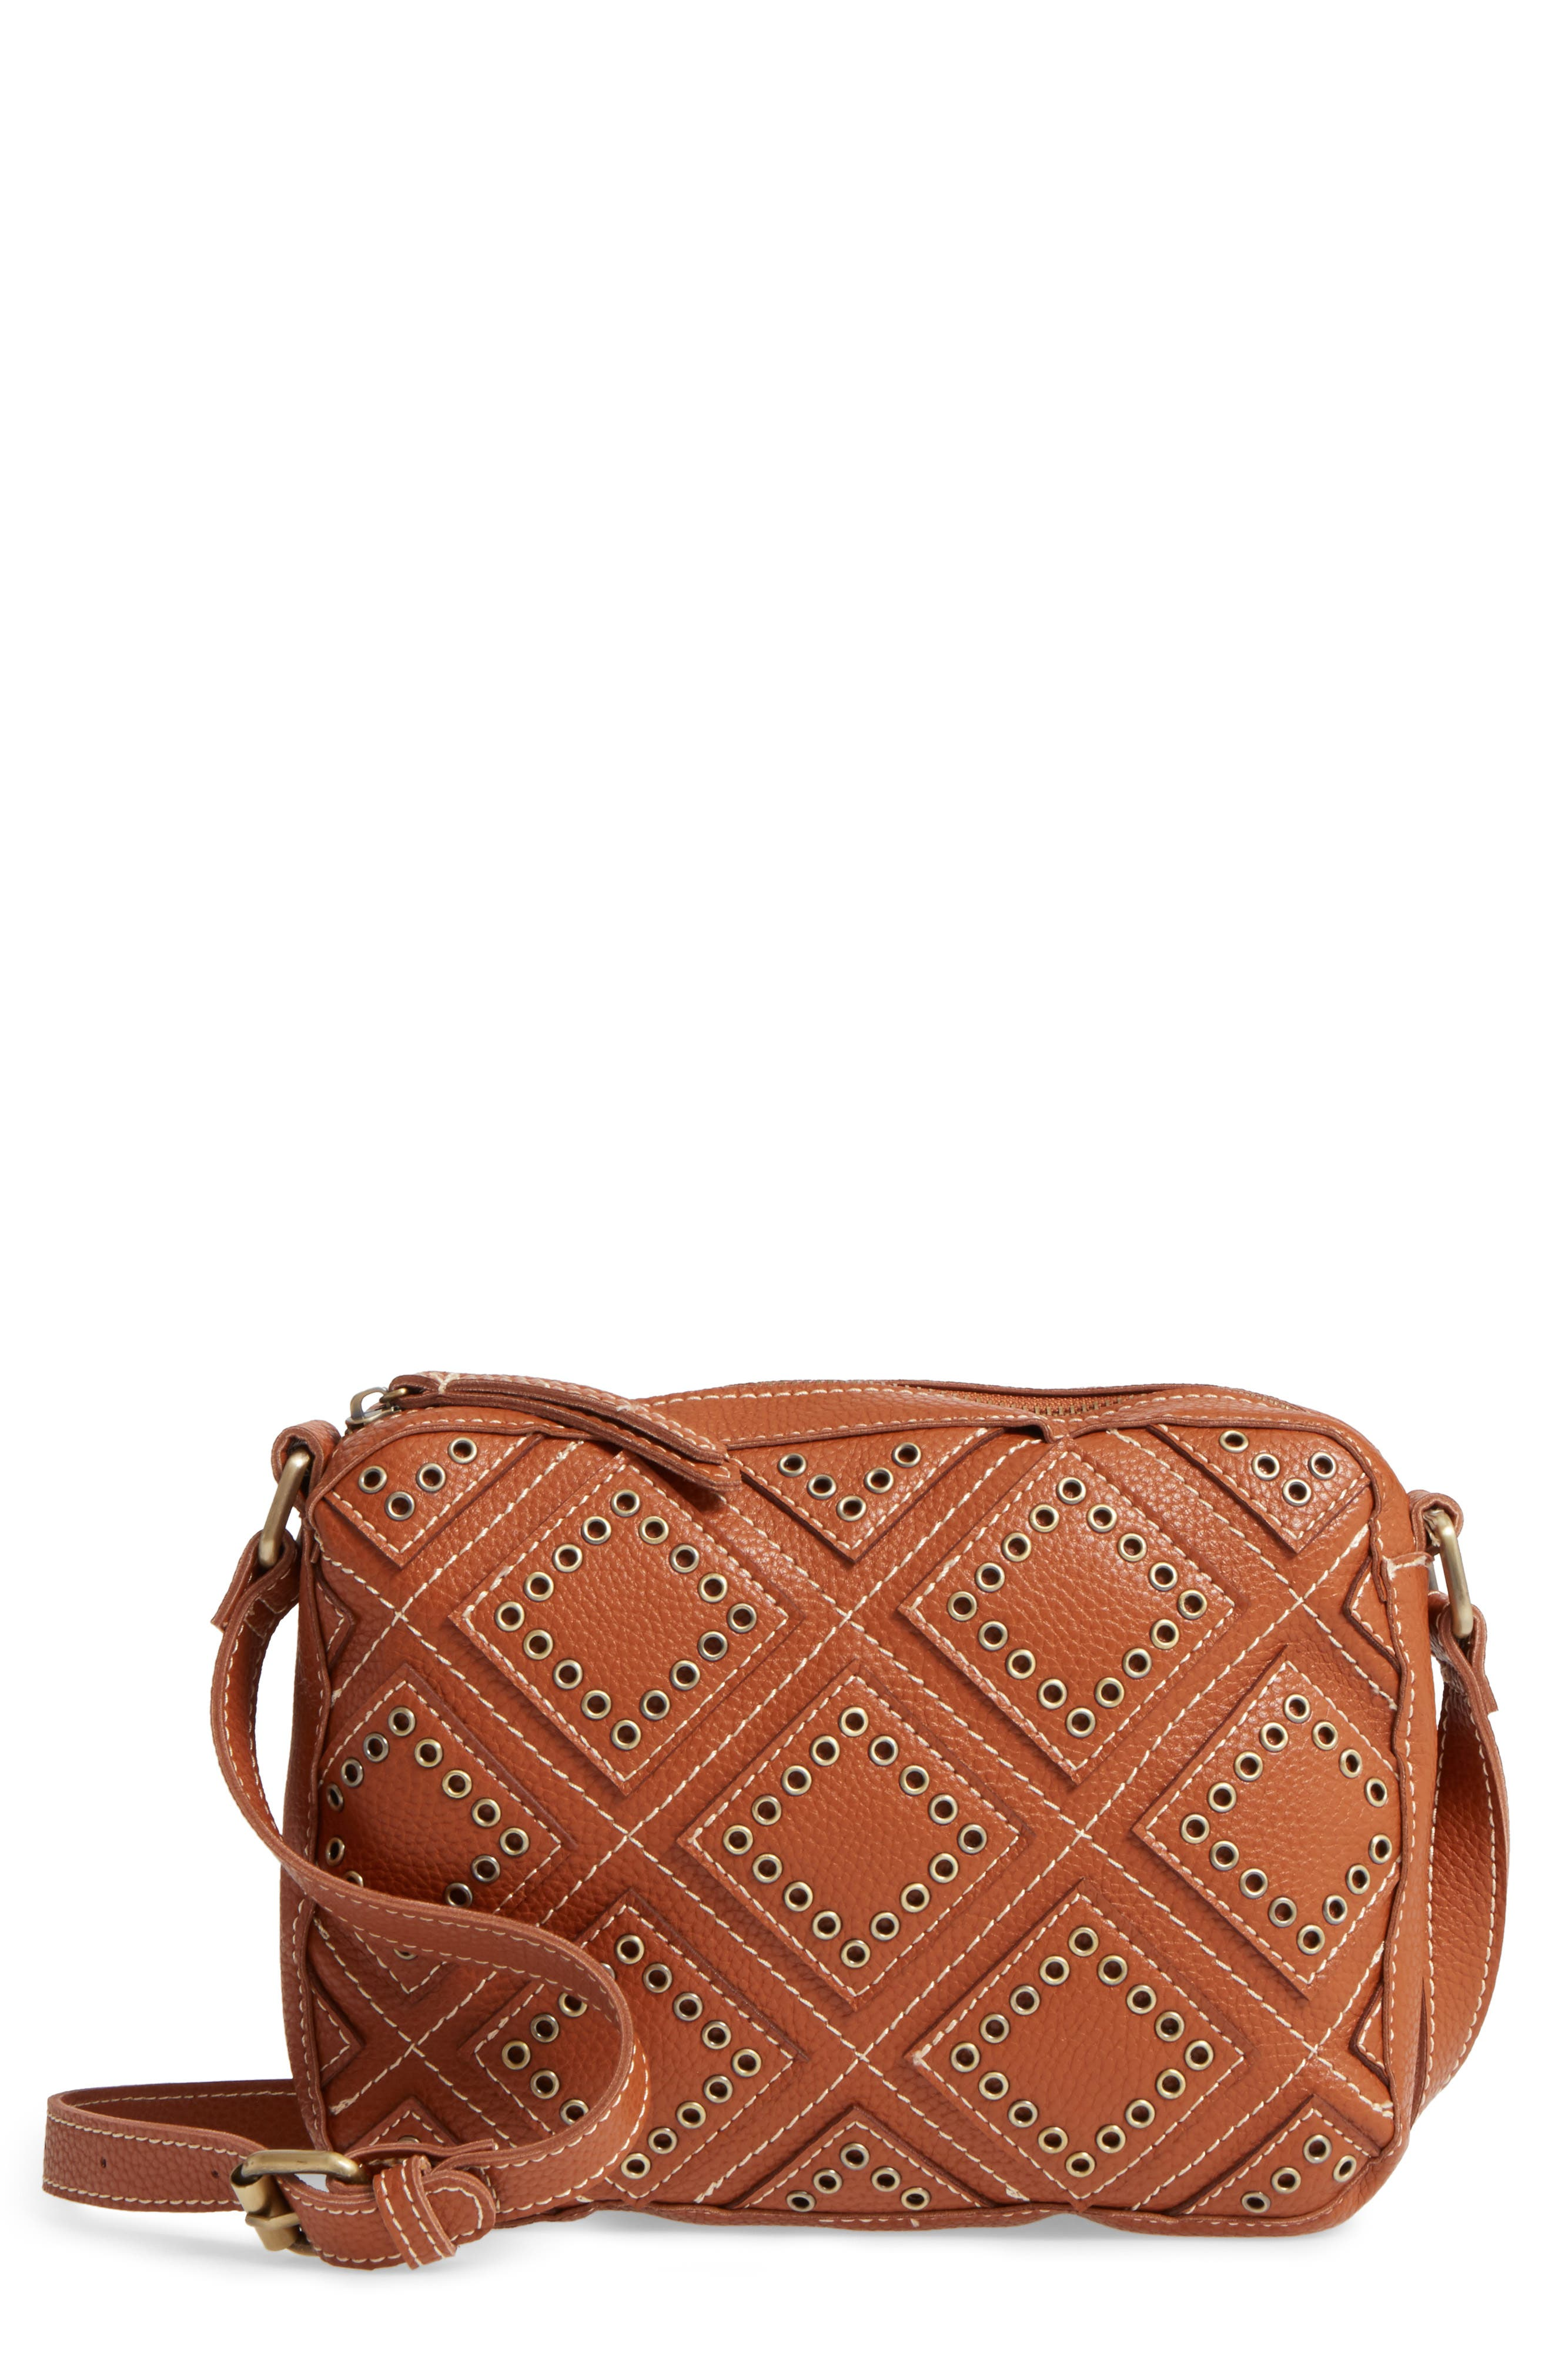 Skylar Faux Leather Crossbody Bag,                             Main thumbnail 1, color,                             Saddle